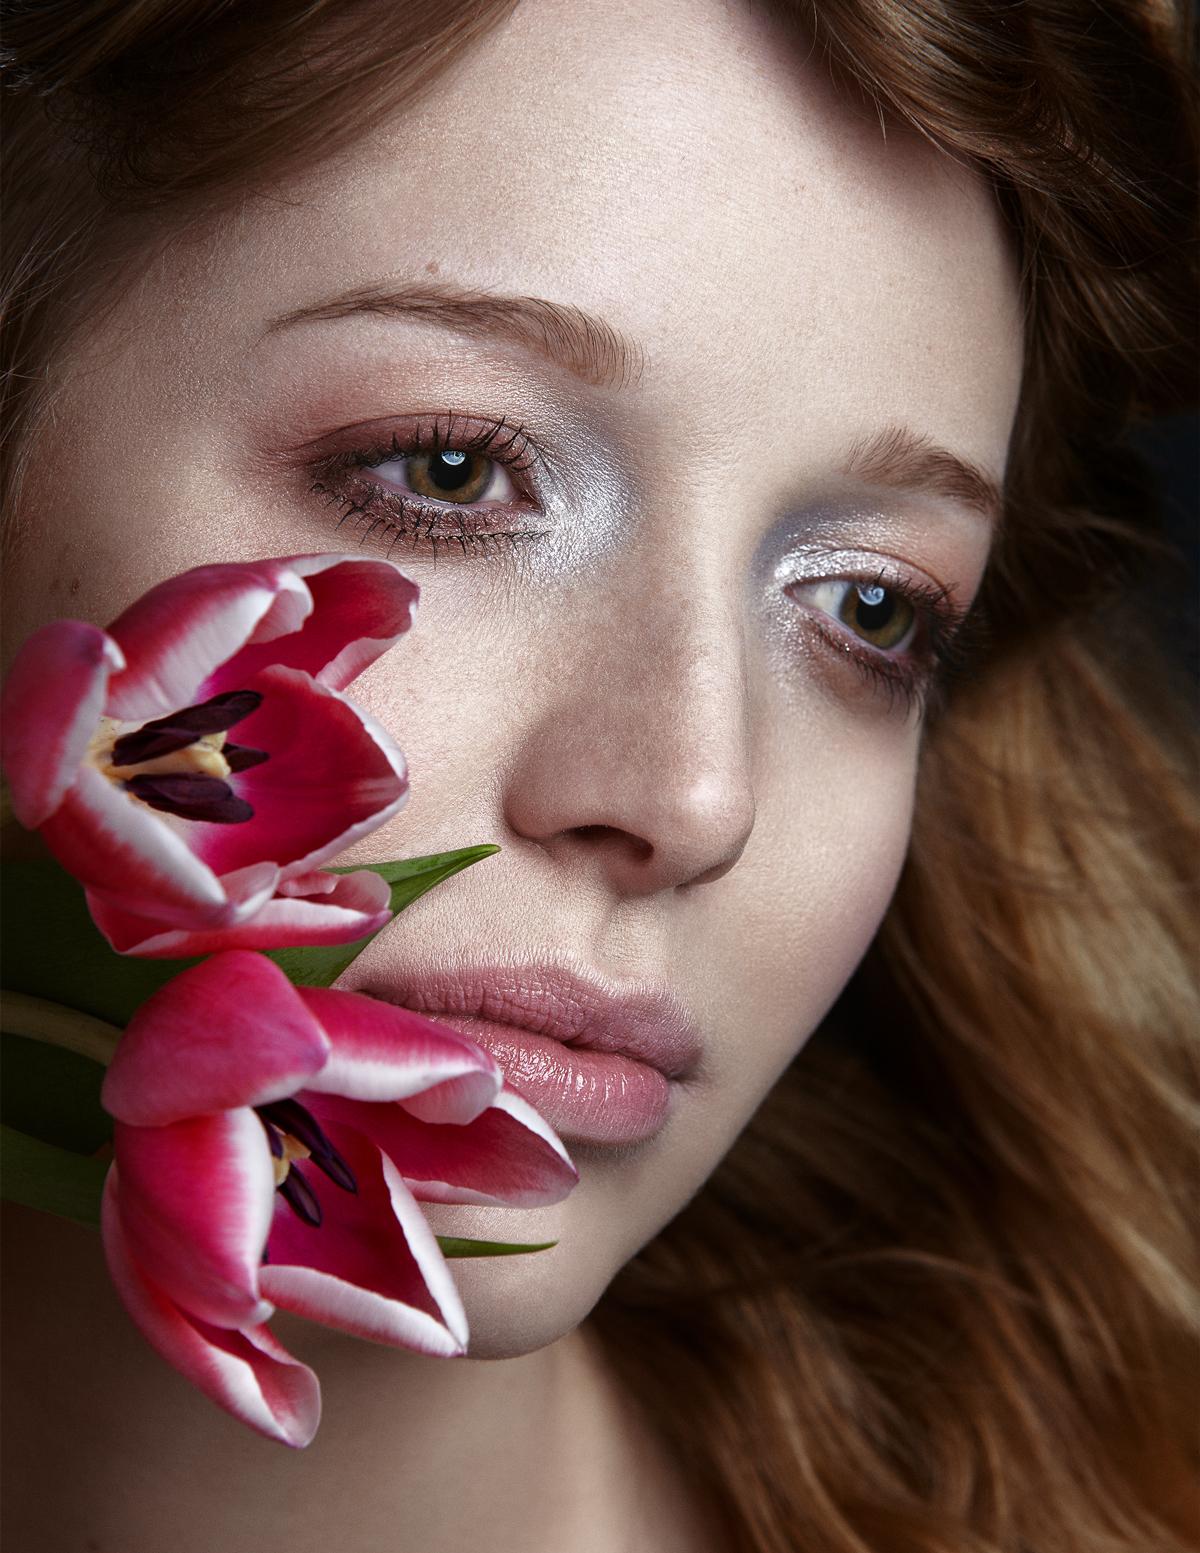 DUSKYFLOWER_Emilie_Tournevache_Photographer_Montreal_Fashion_Beauty